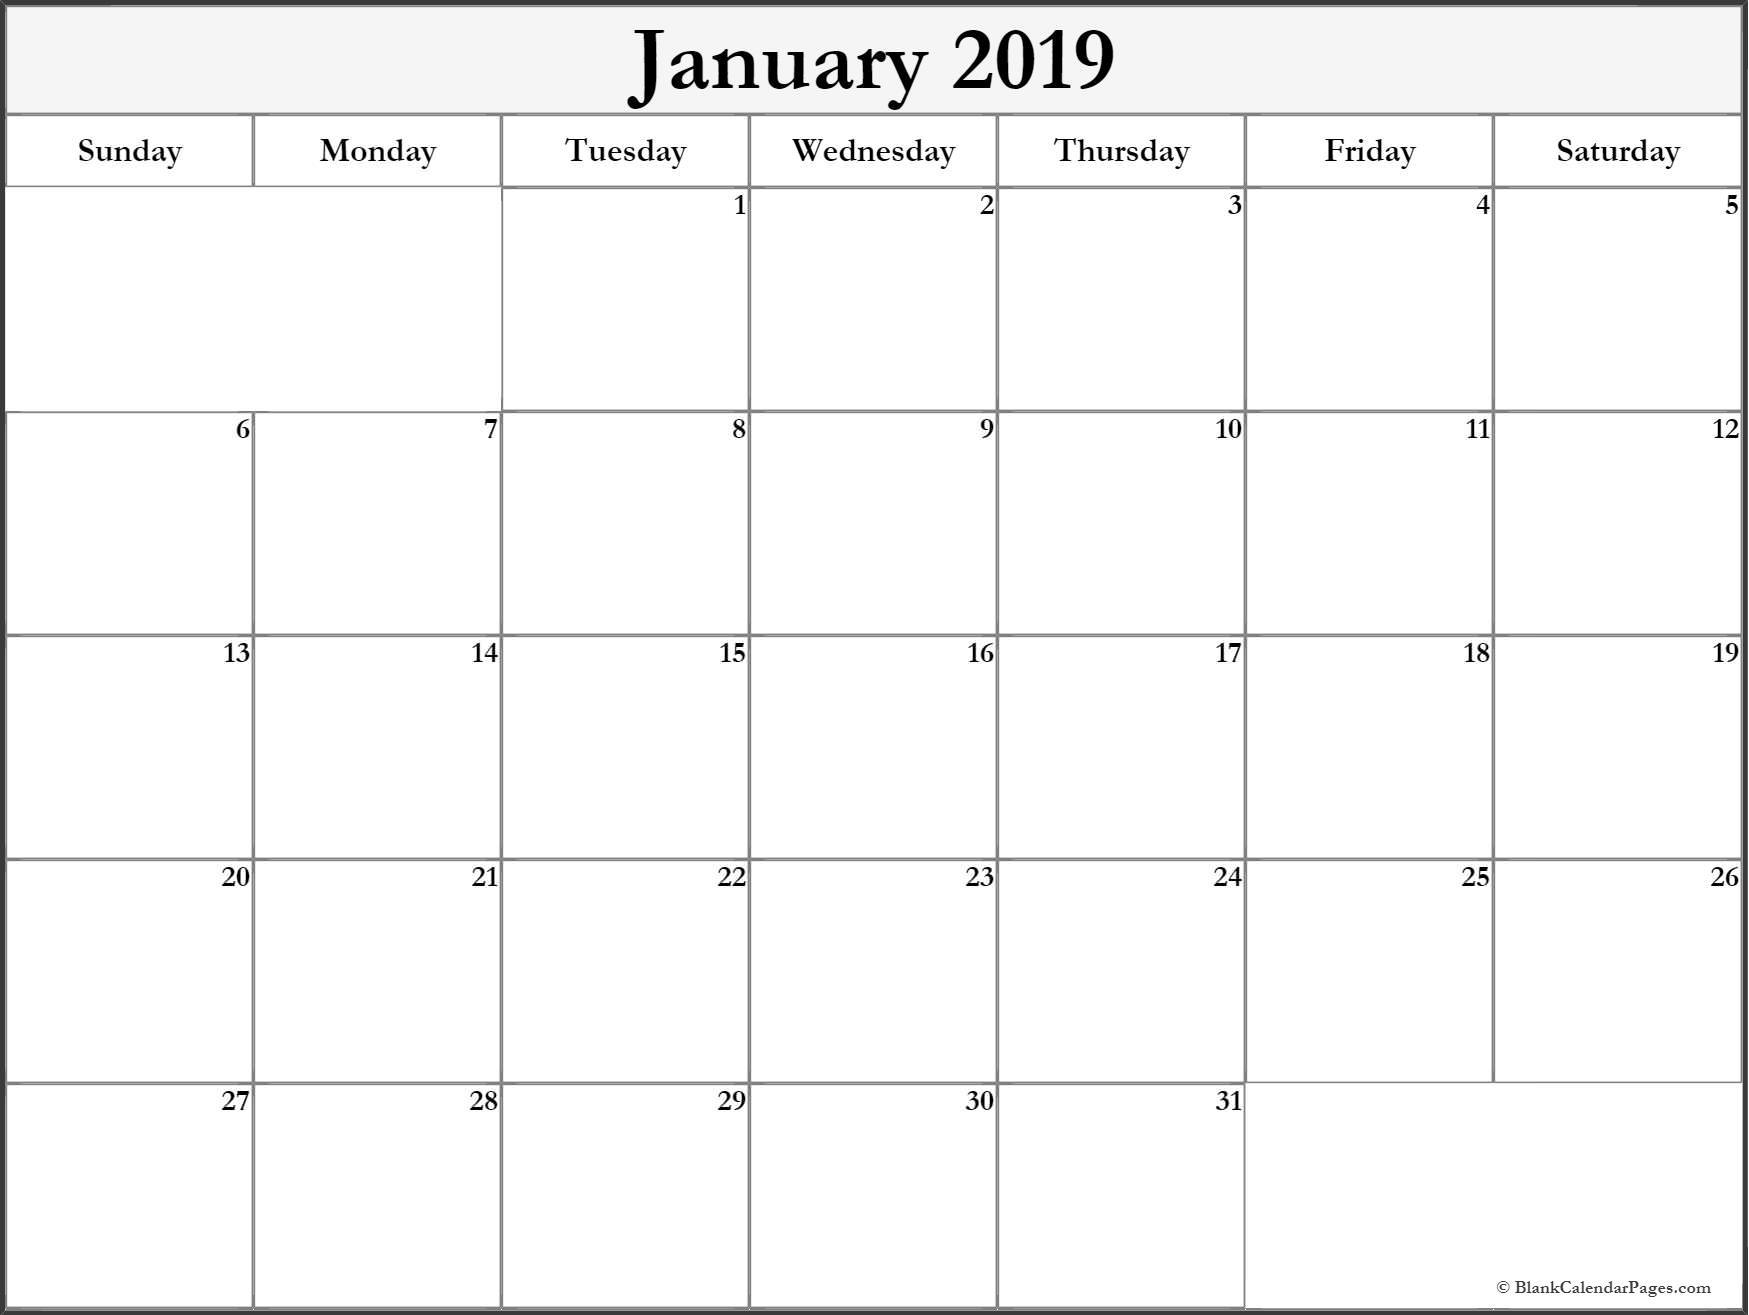 january 2019 free printable blank calendar collection::January 2019 Monthly Calendar